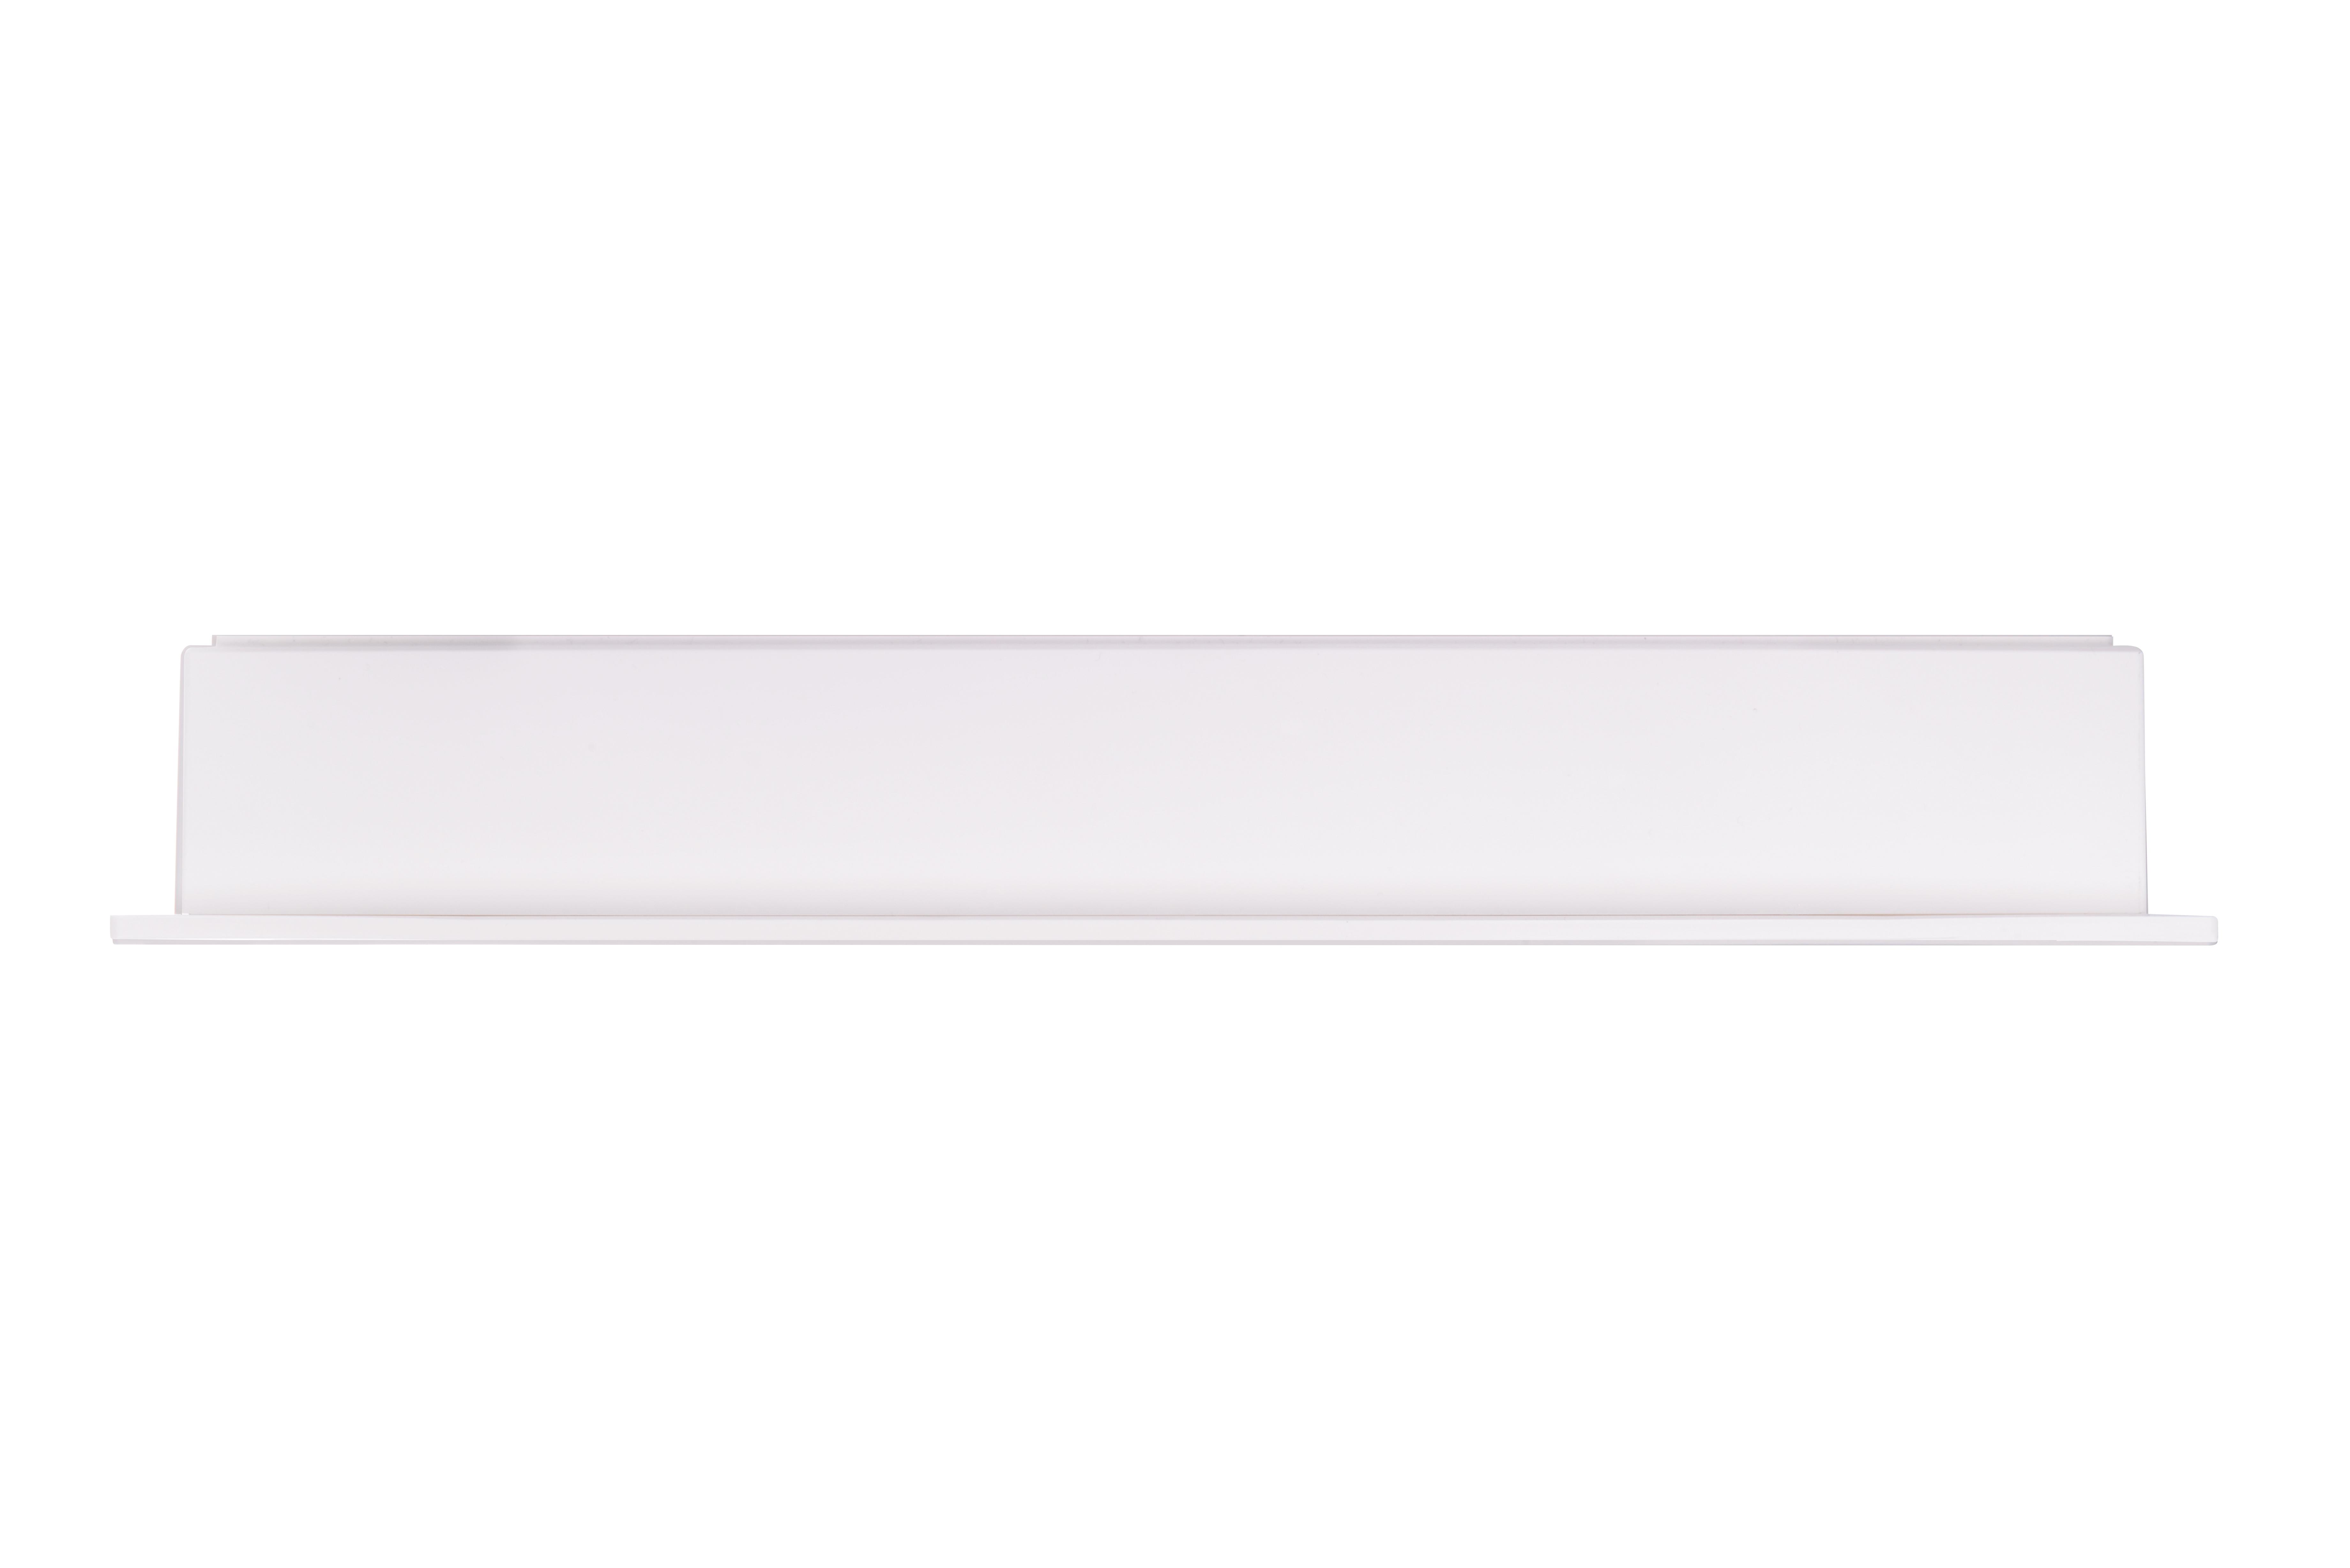 Lampa emergenta led Intelight 94562   3h mentinut test automat 5